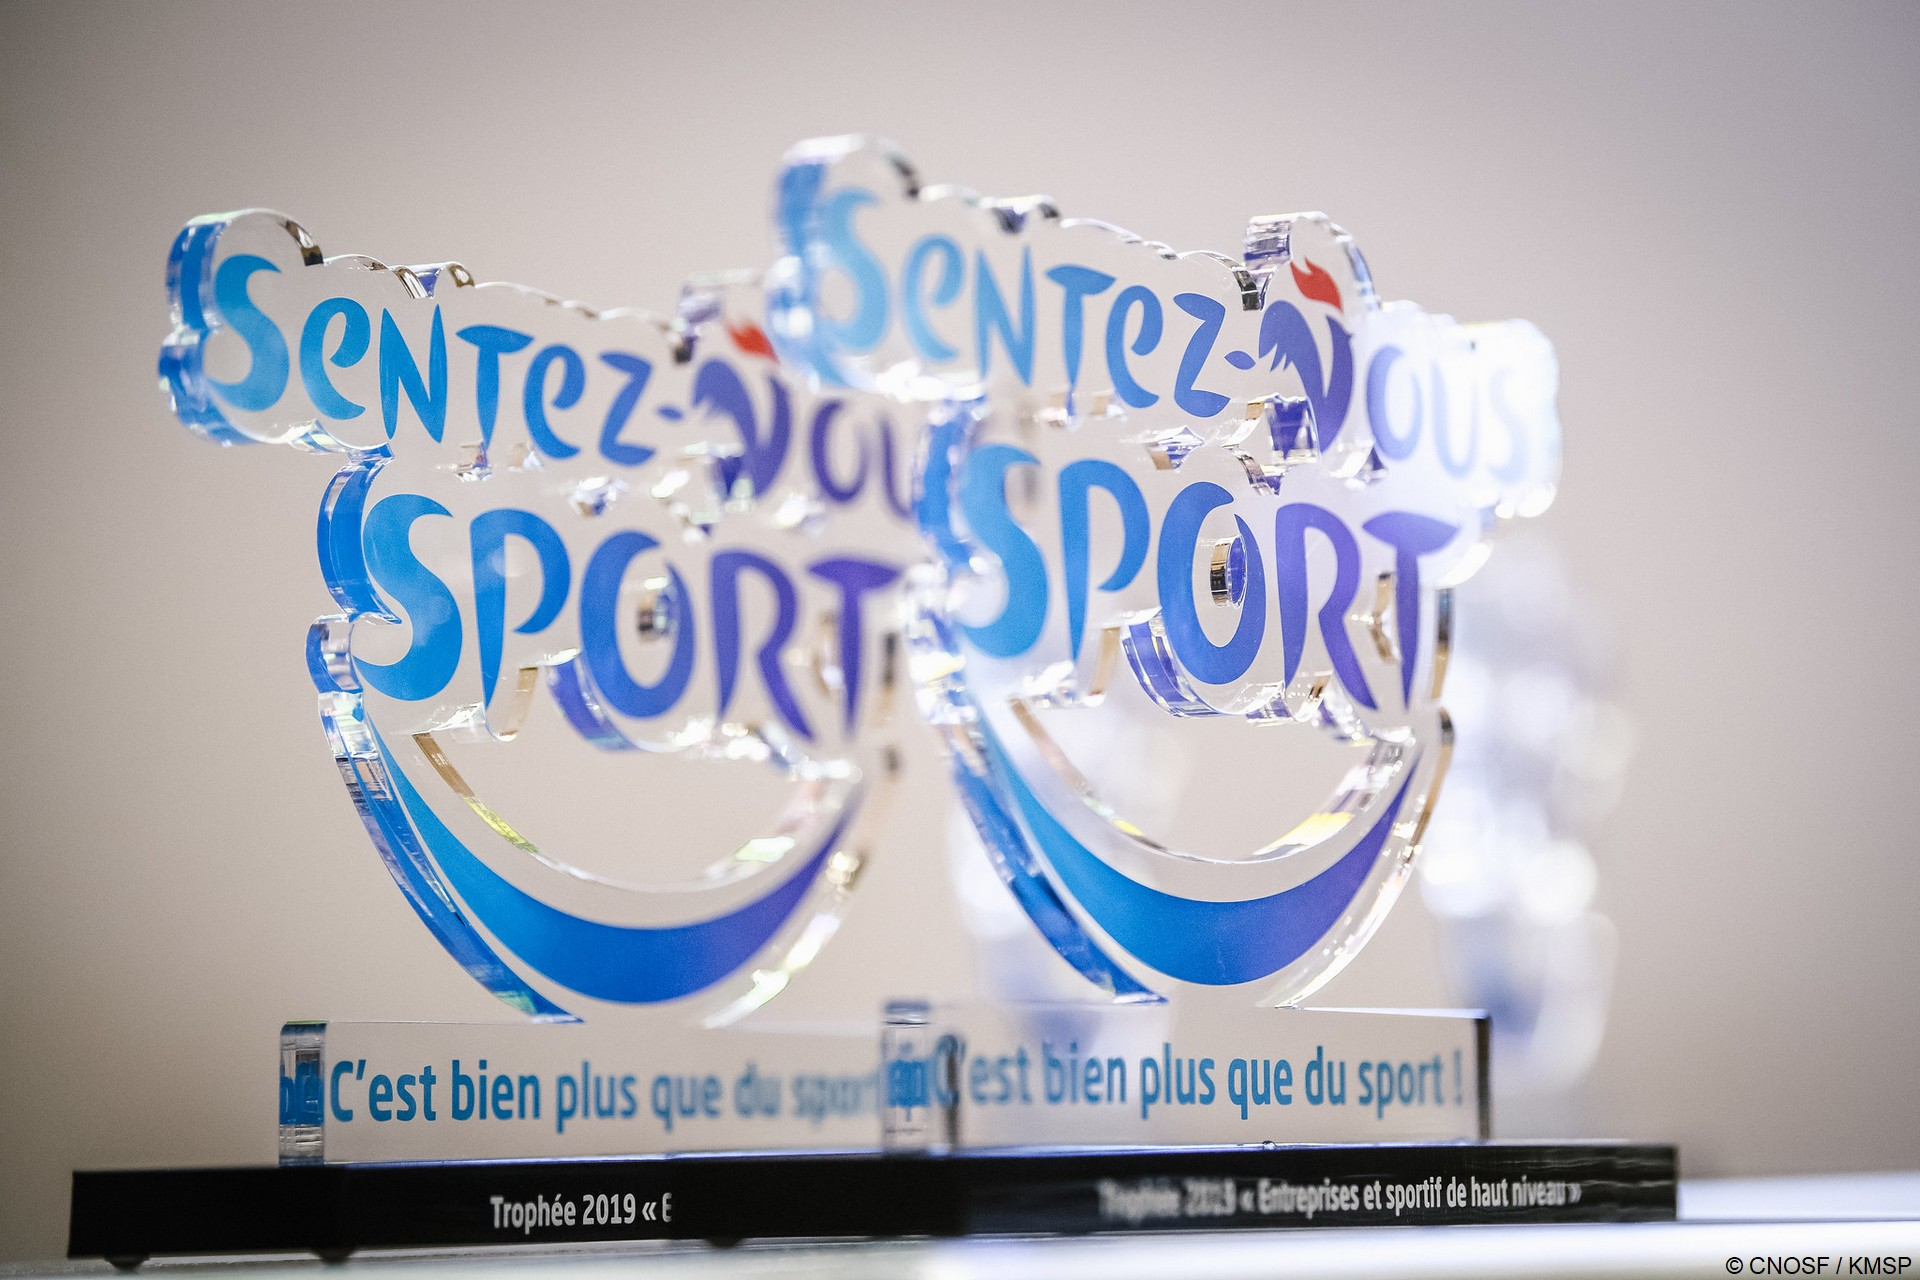 Trophées Sentez-vous Sport CNOSF